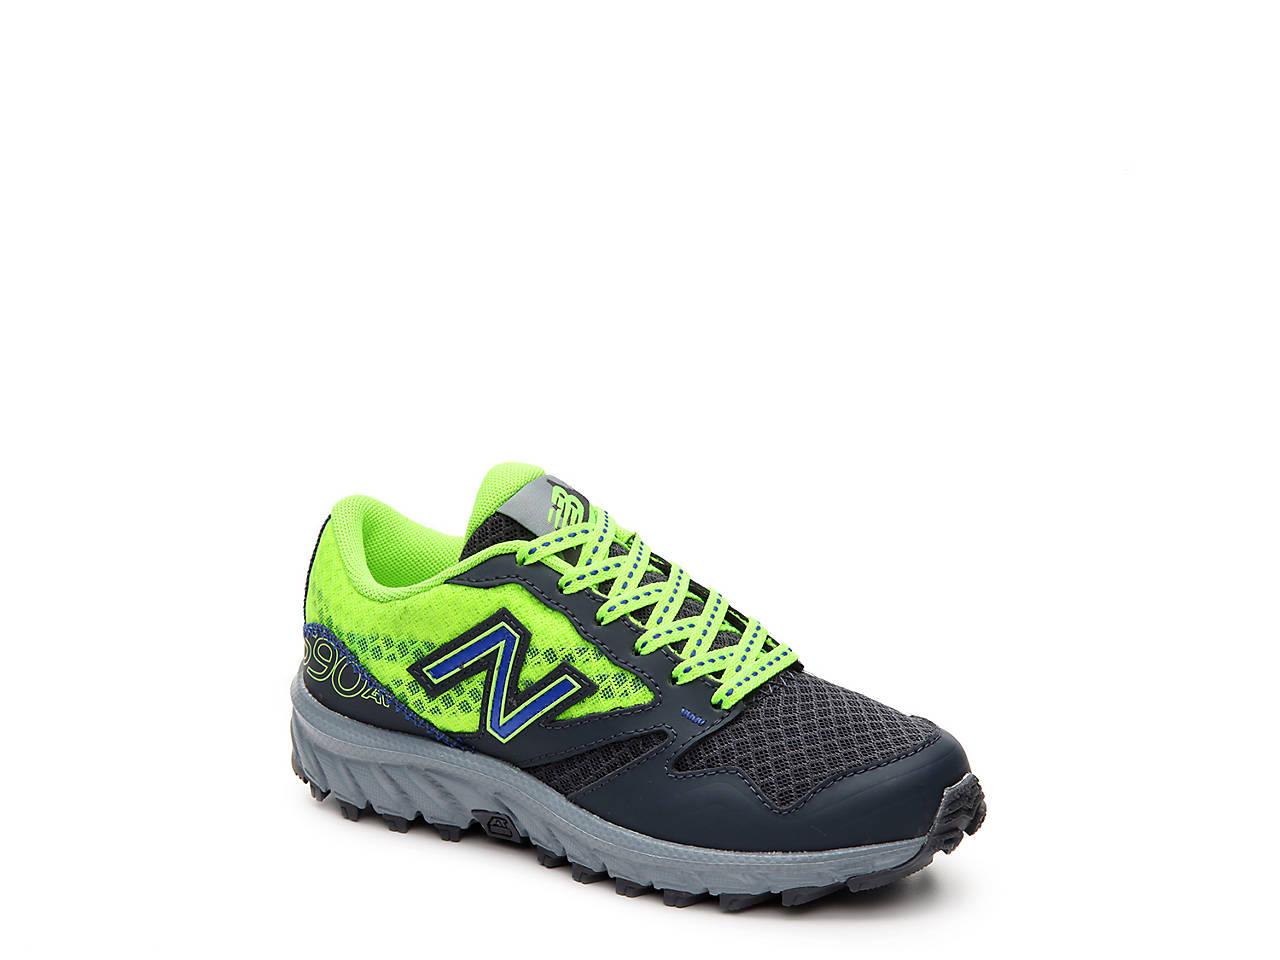 690 AT Toddler & Youth Running Shoe